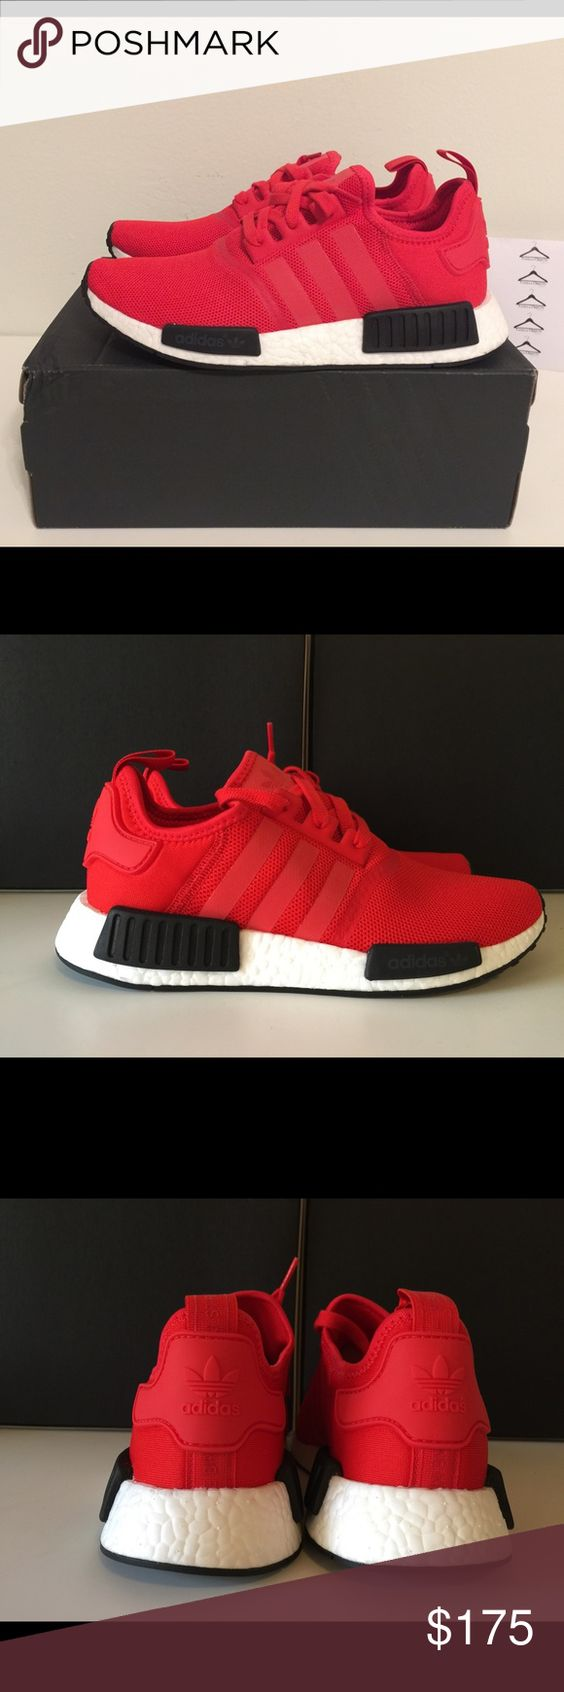 adidas nmd r1 rednwt adidas nmd r1 nmd r1 and adidas nmd